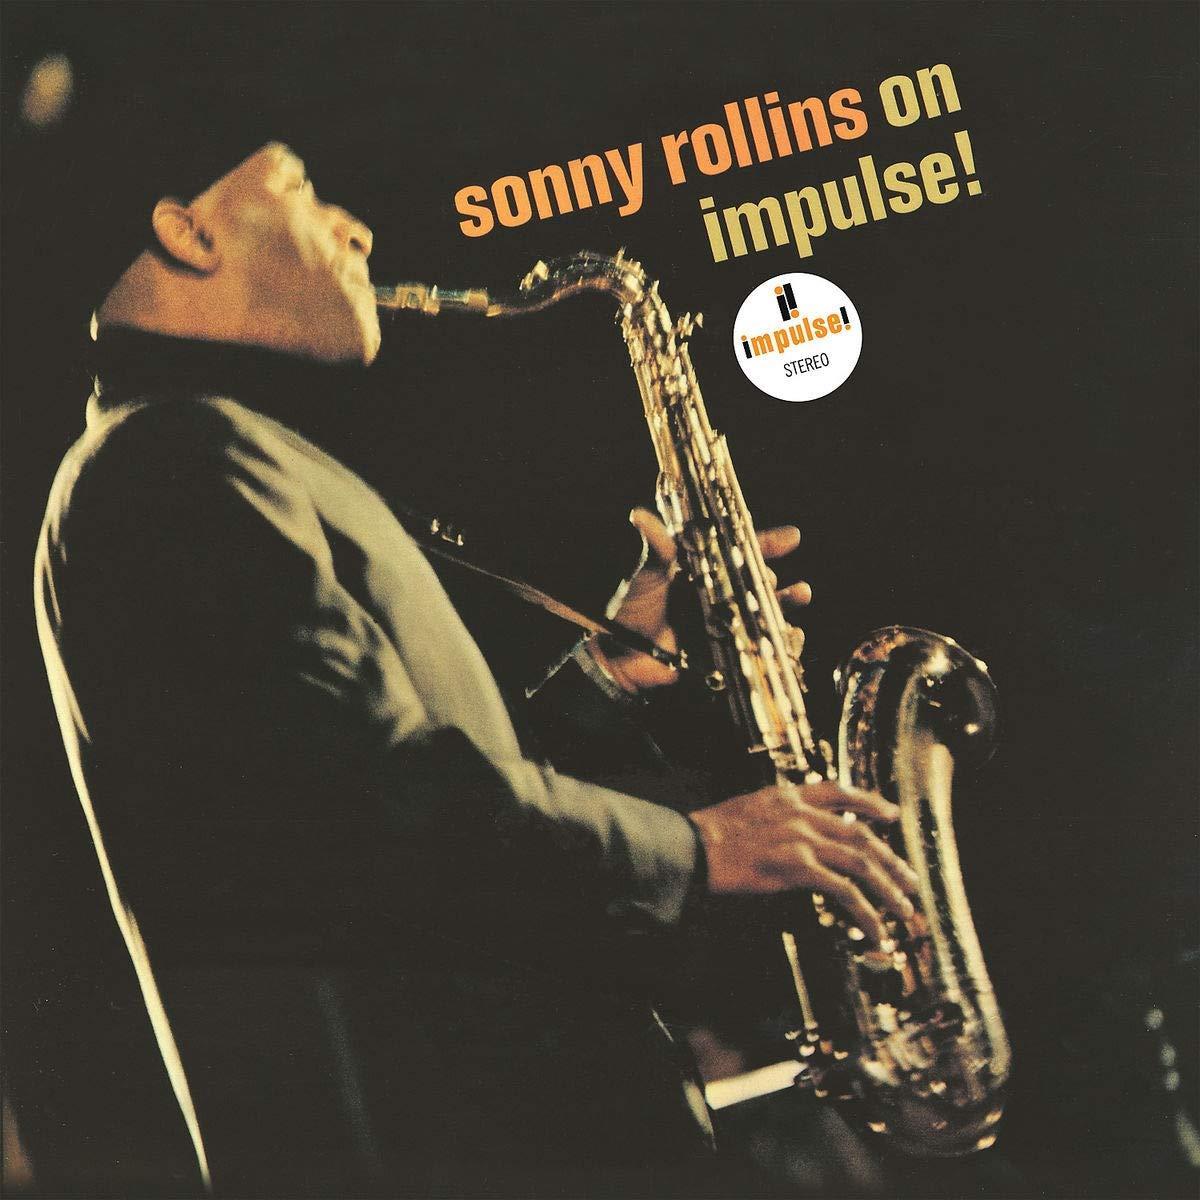 Sonny Rollins - On Impulse! [LP]